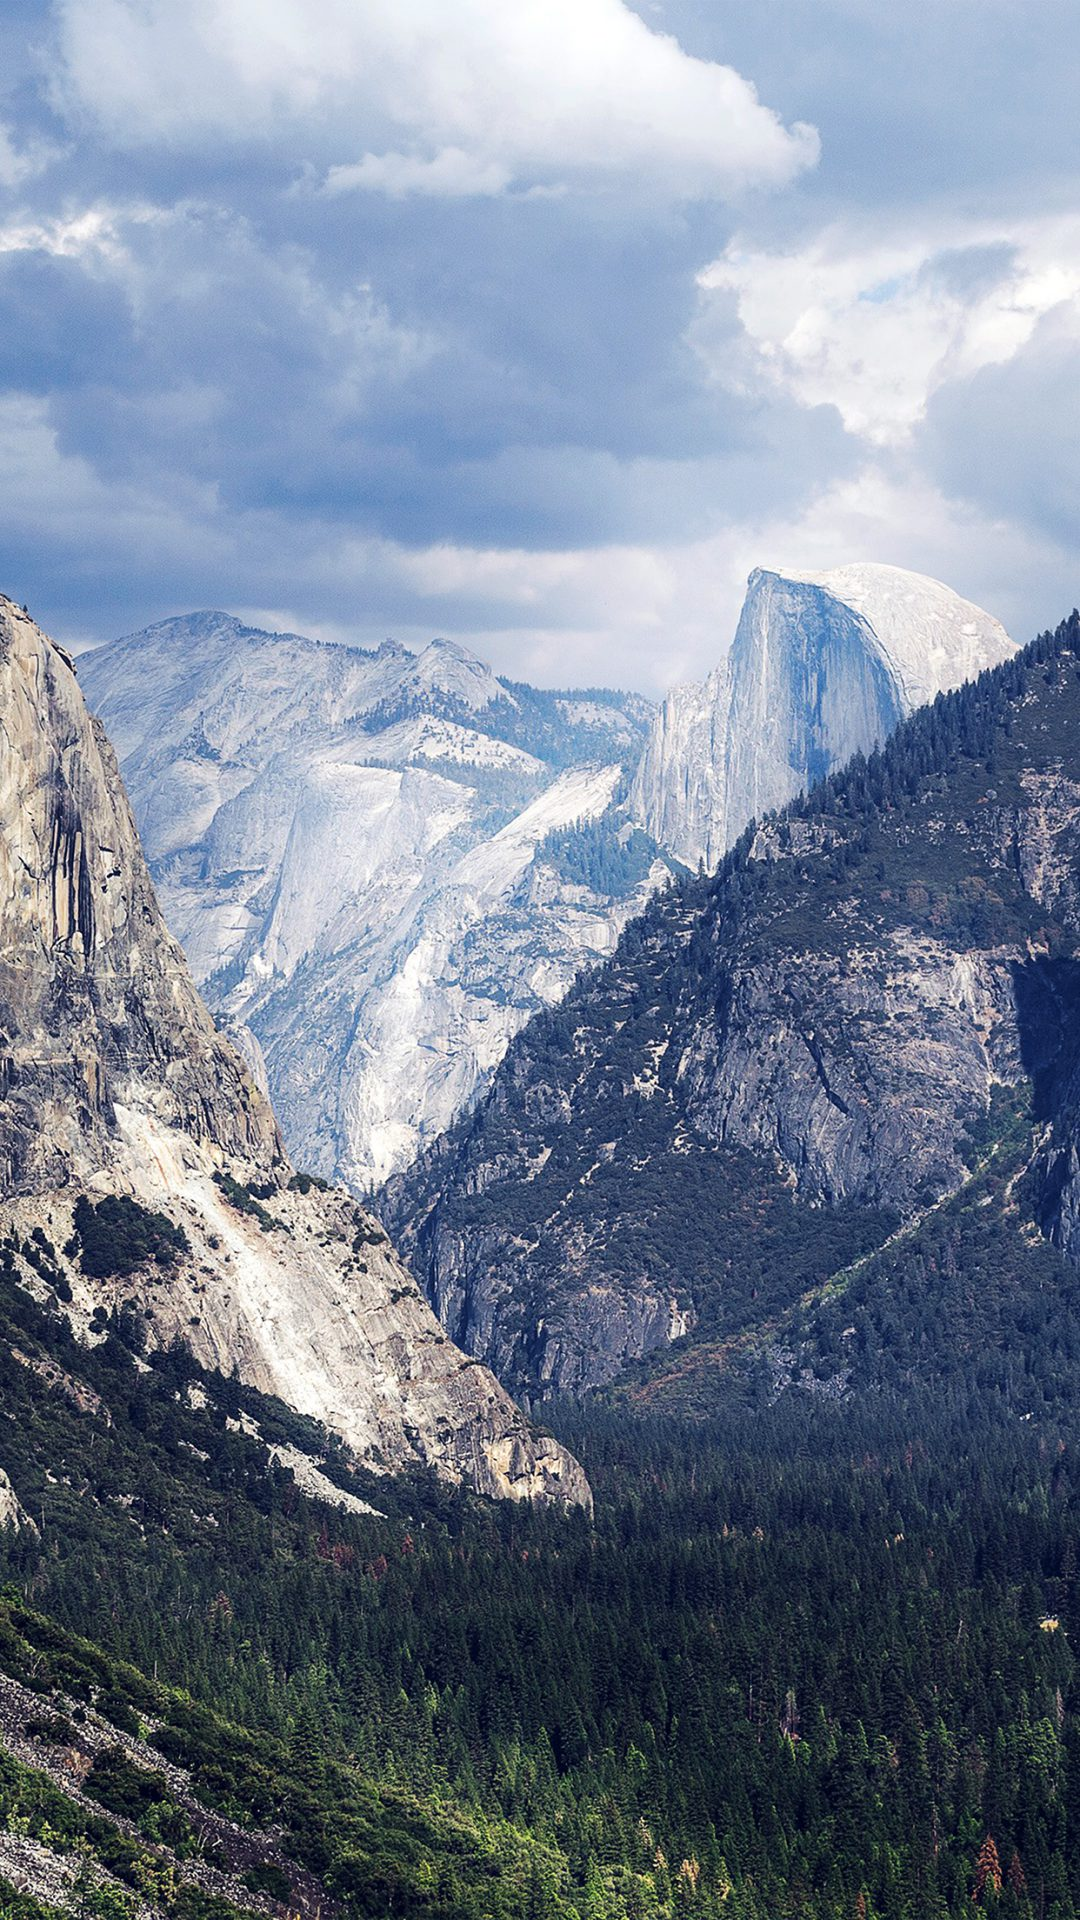 Yosemite Mountain Nature Rock Sky Forest Cloud Blue